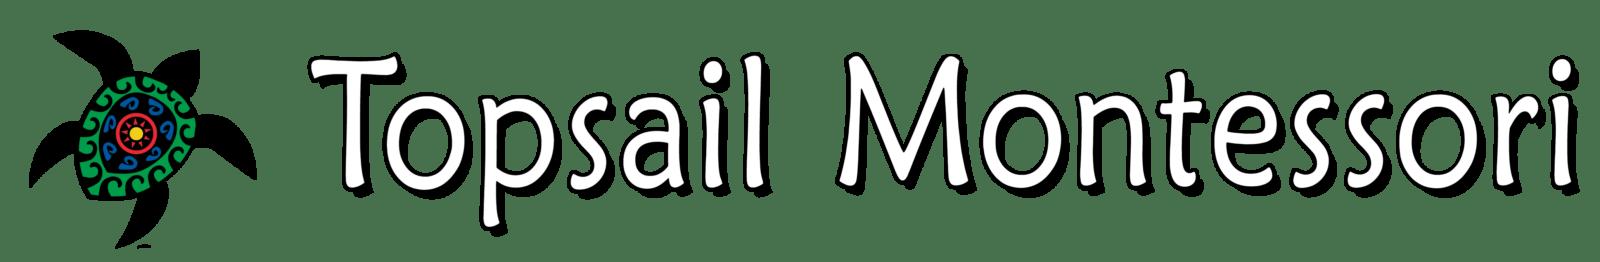 Topsail Montessori